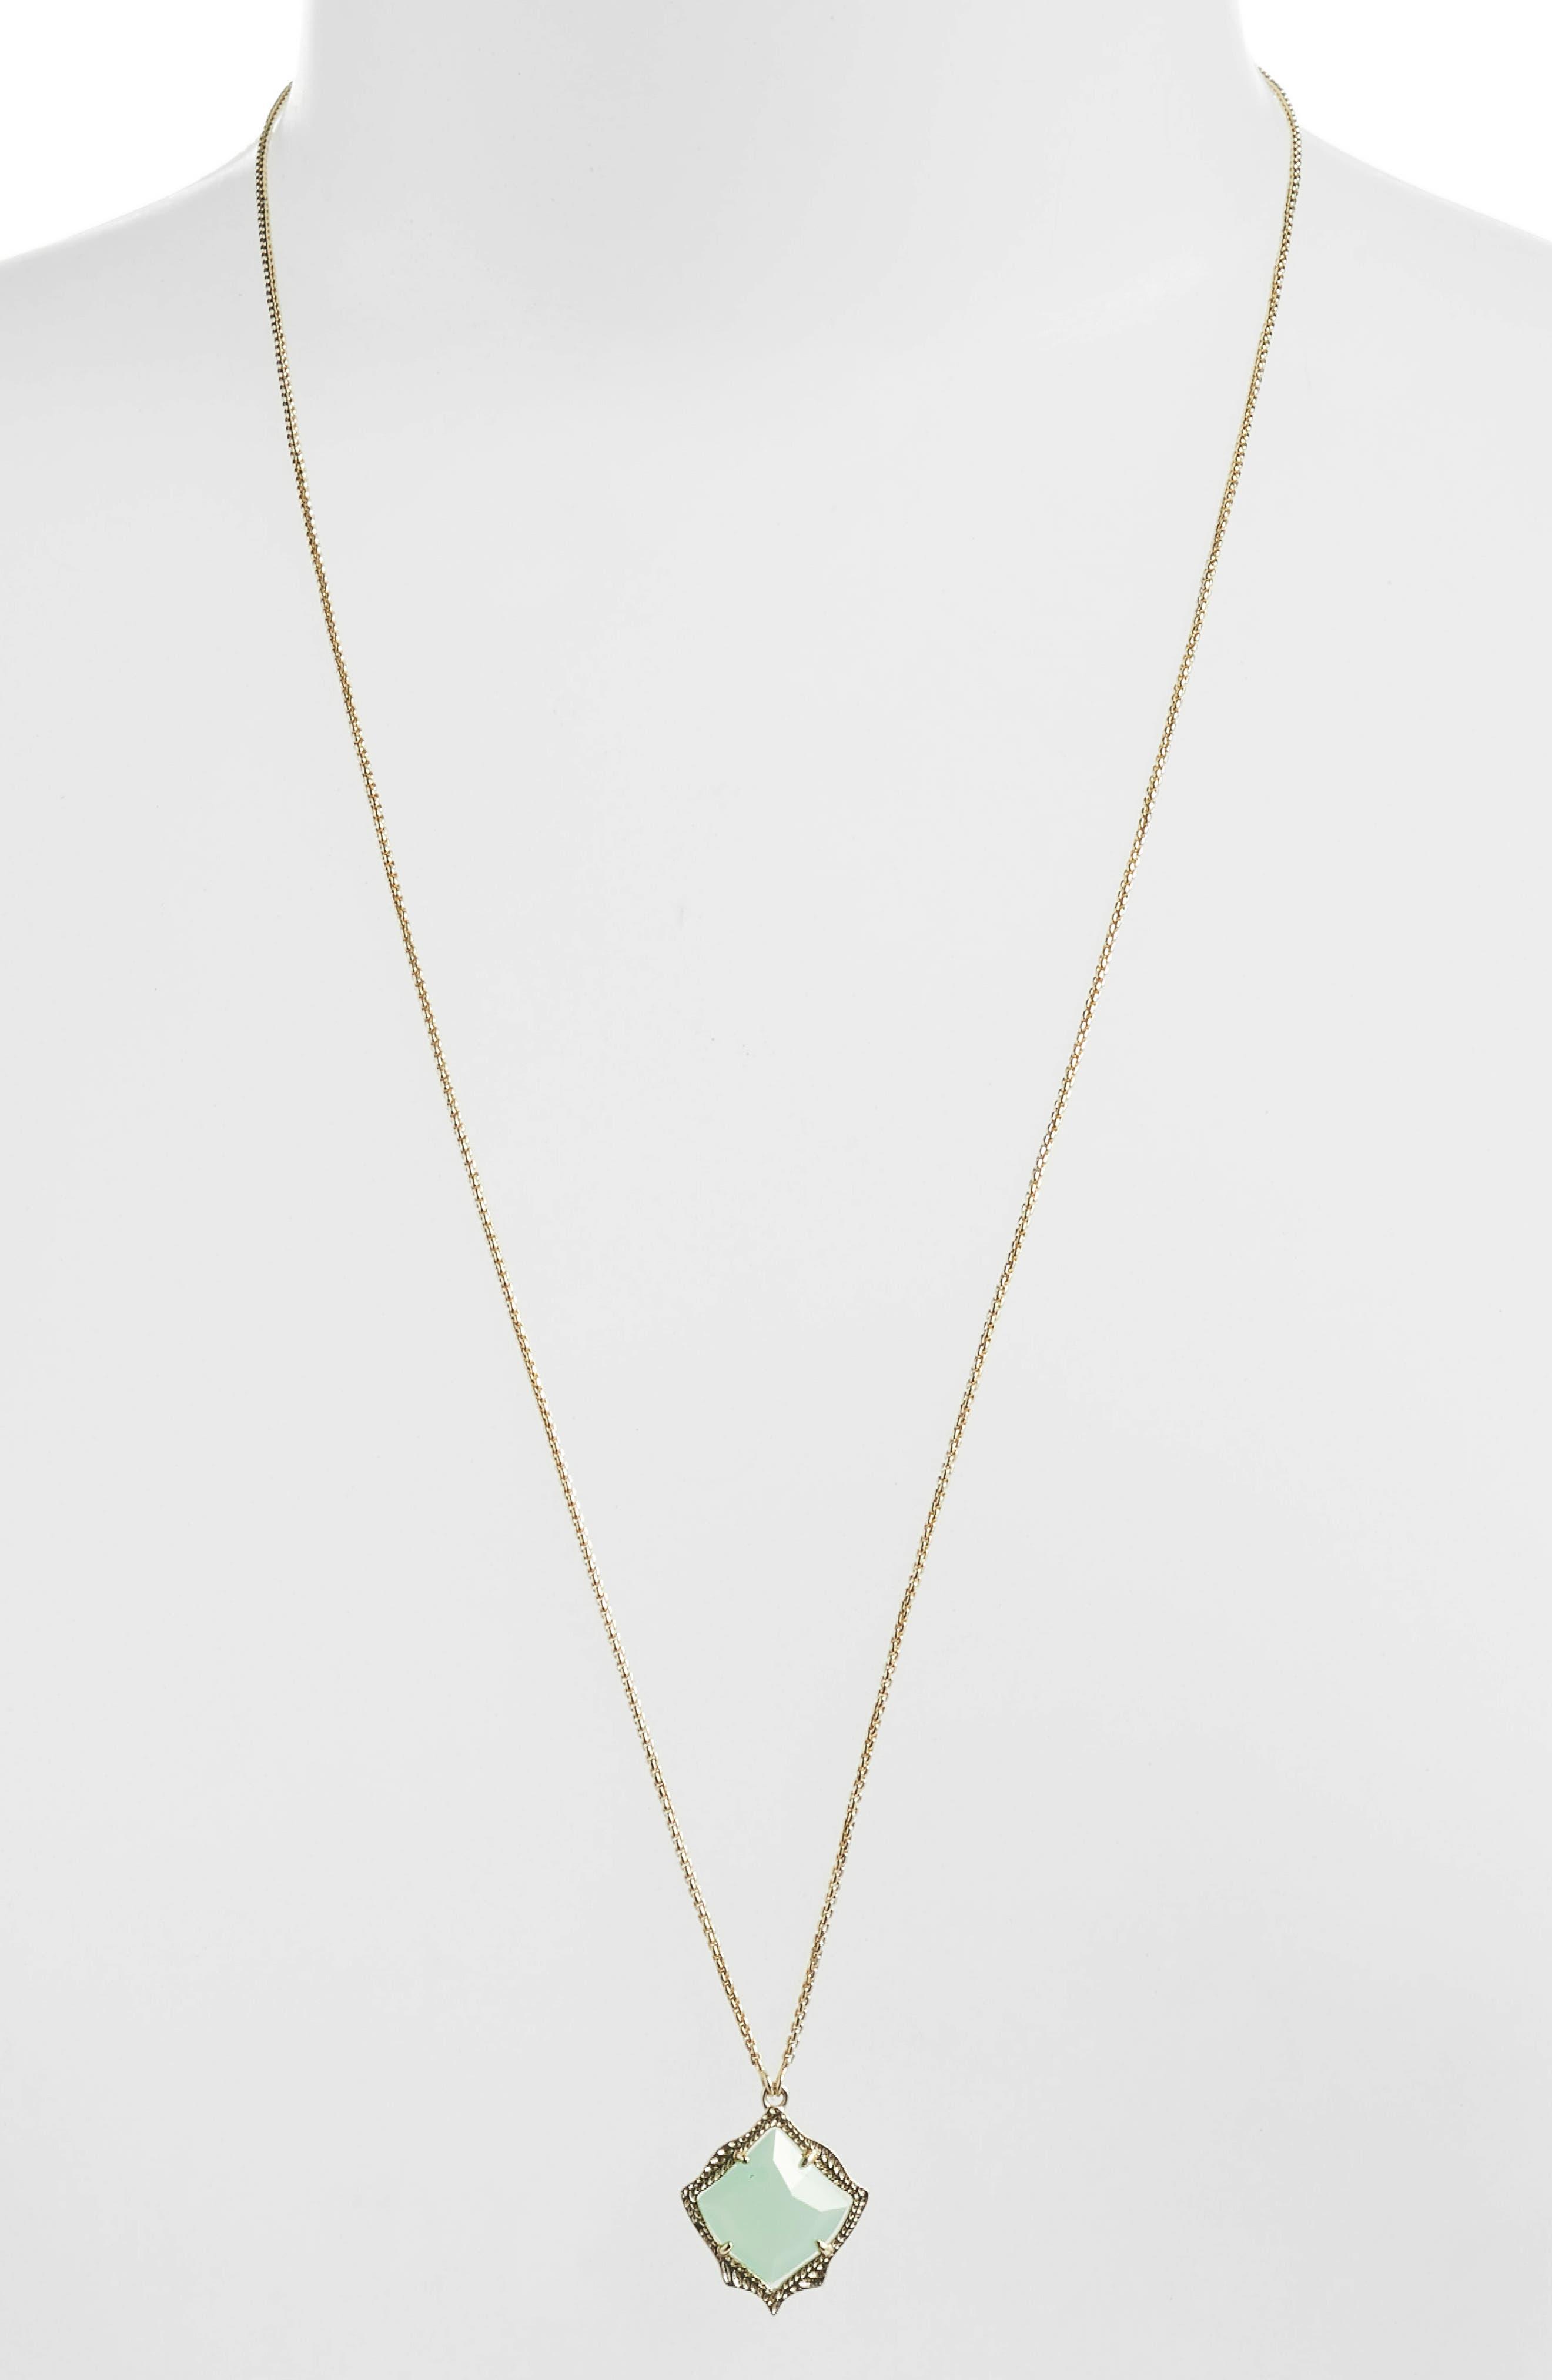 Alternate Image 1 Selected - Kendra Scott Kacey Pendant Necklace